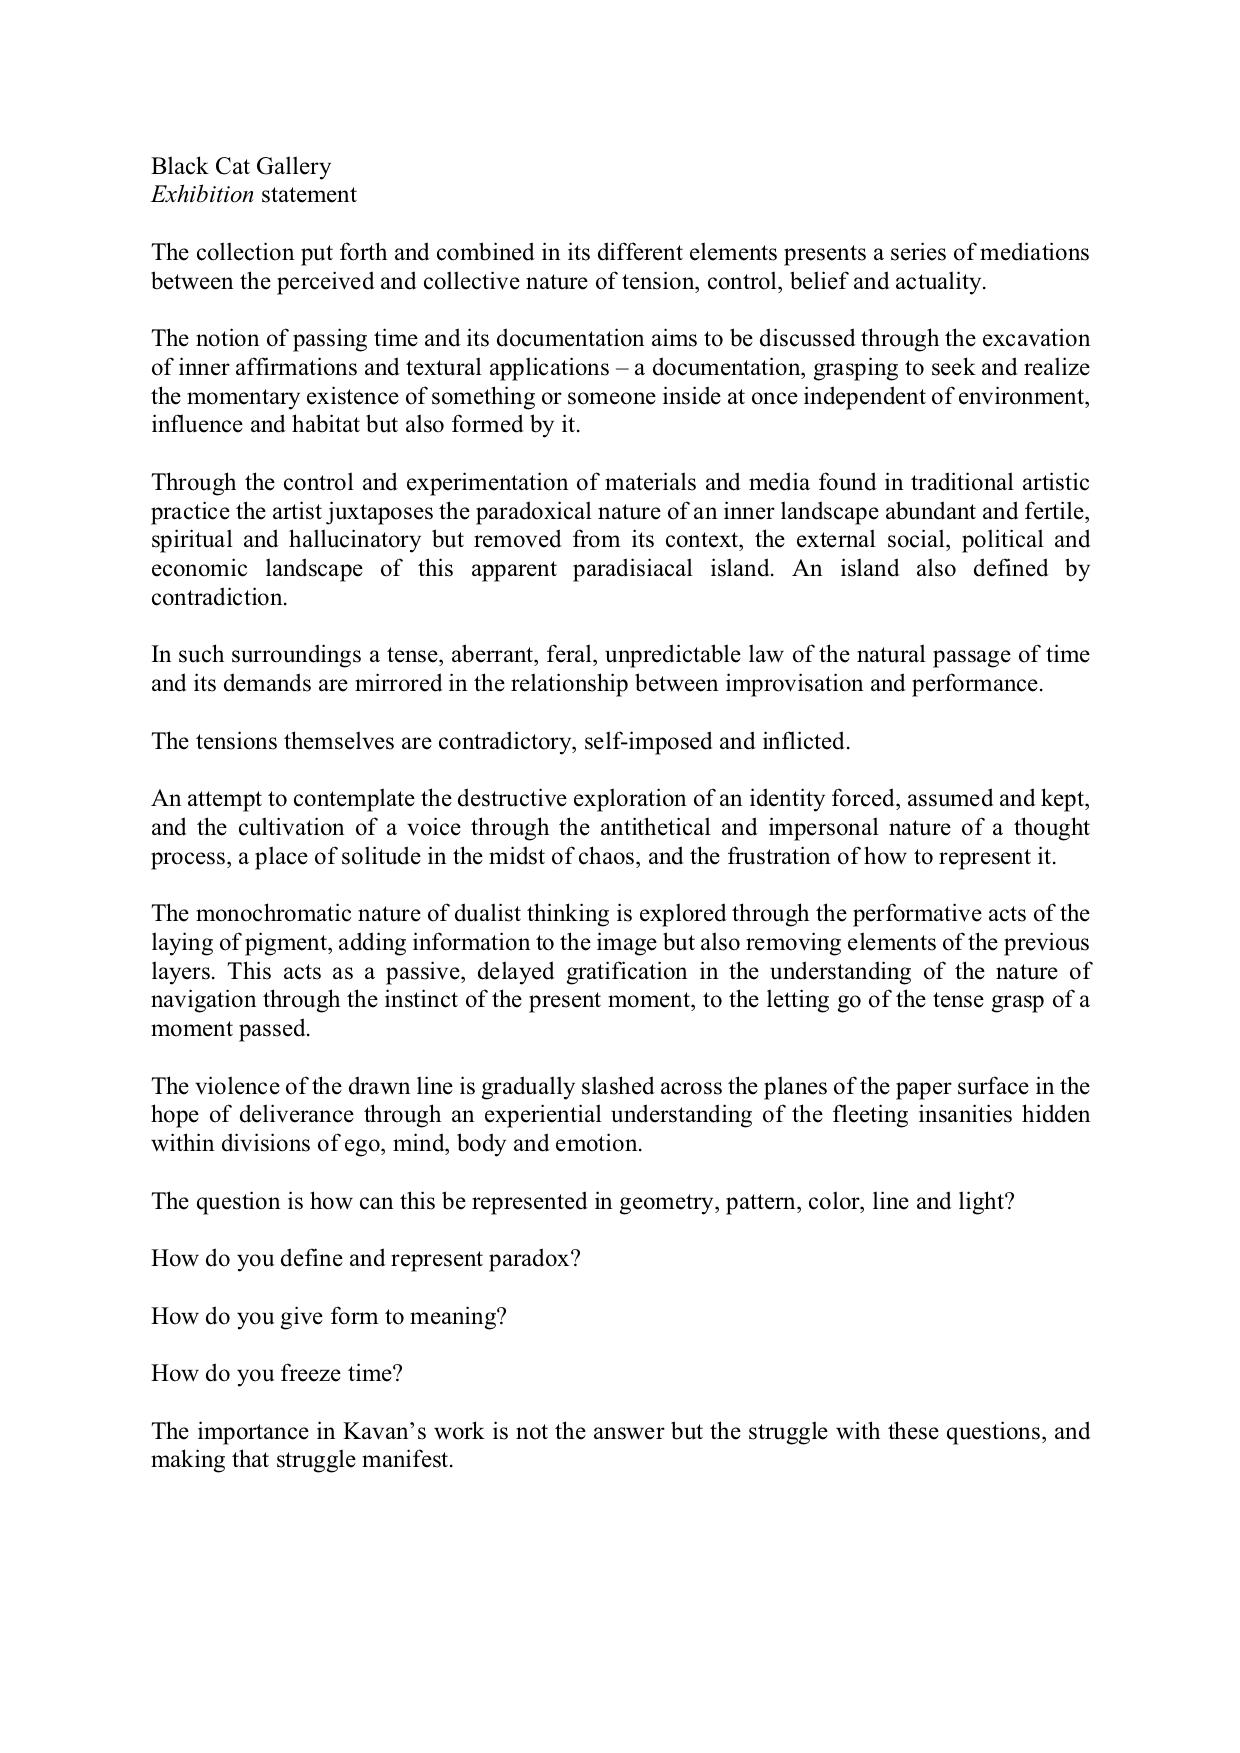 Black Cat Gallery statement.jpg